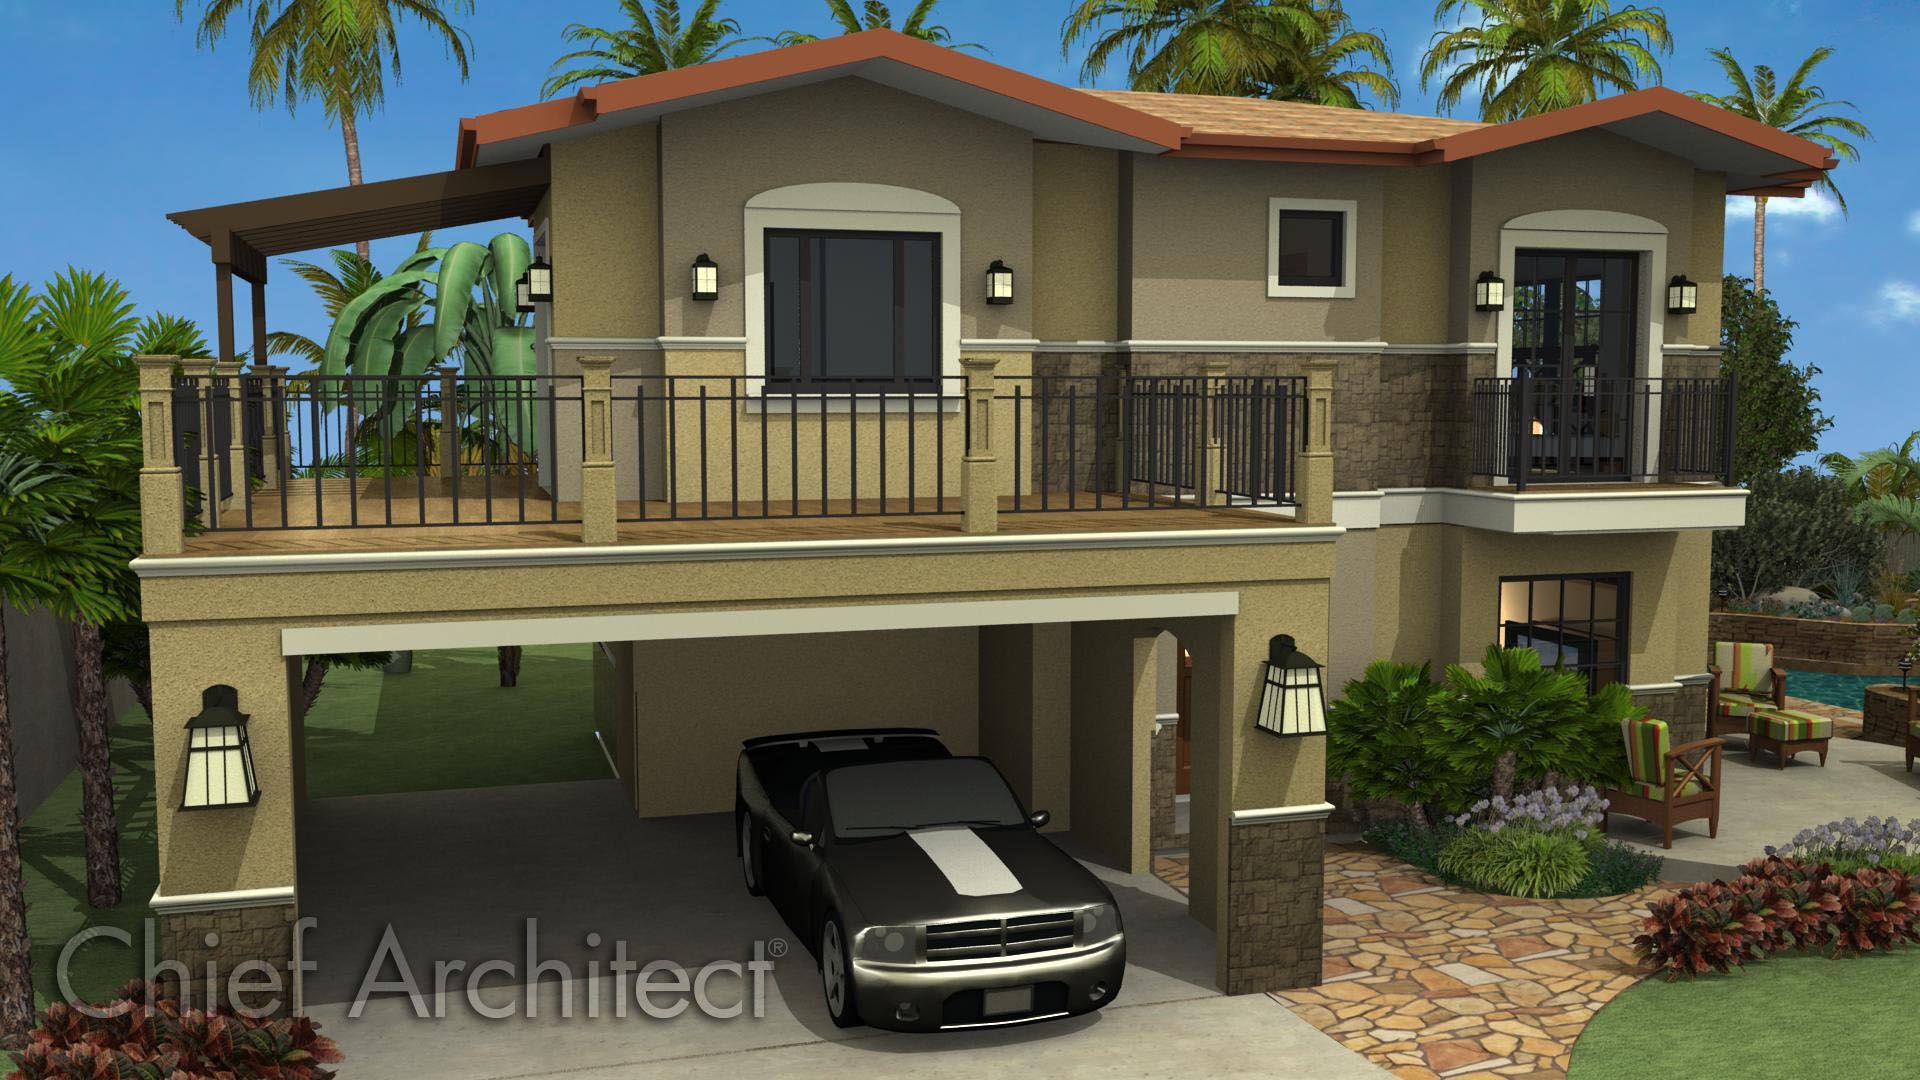 Home Design Chief Architect Chief Architect Home Design Software Architect Software